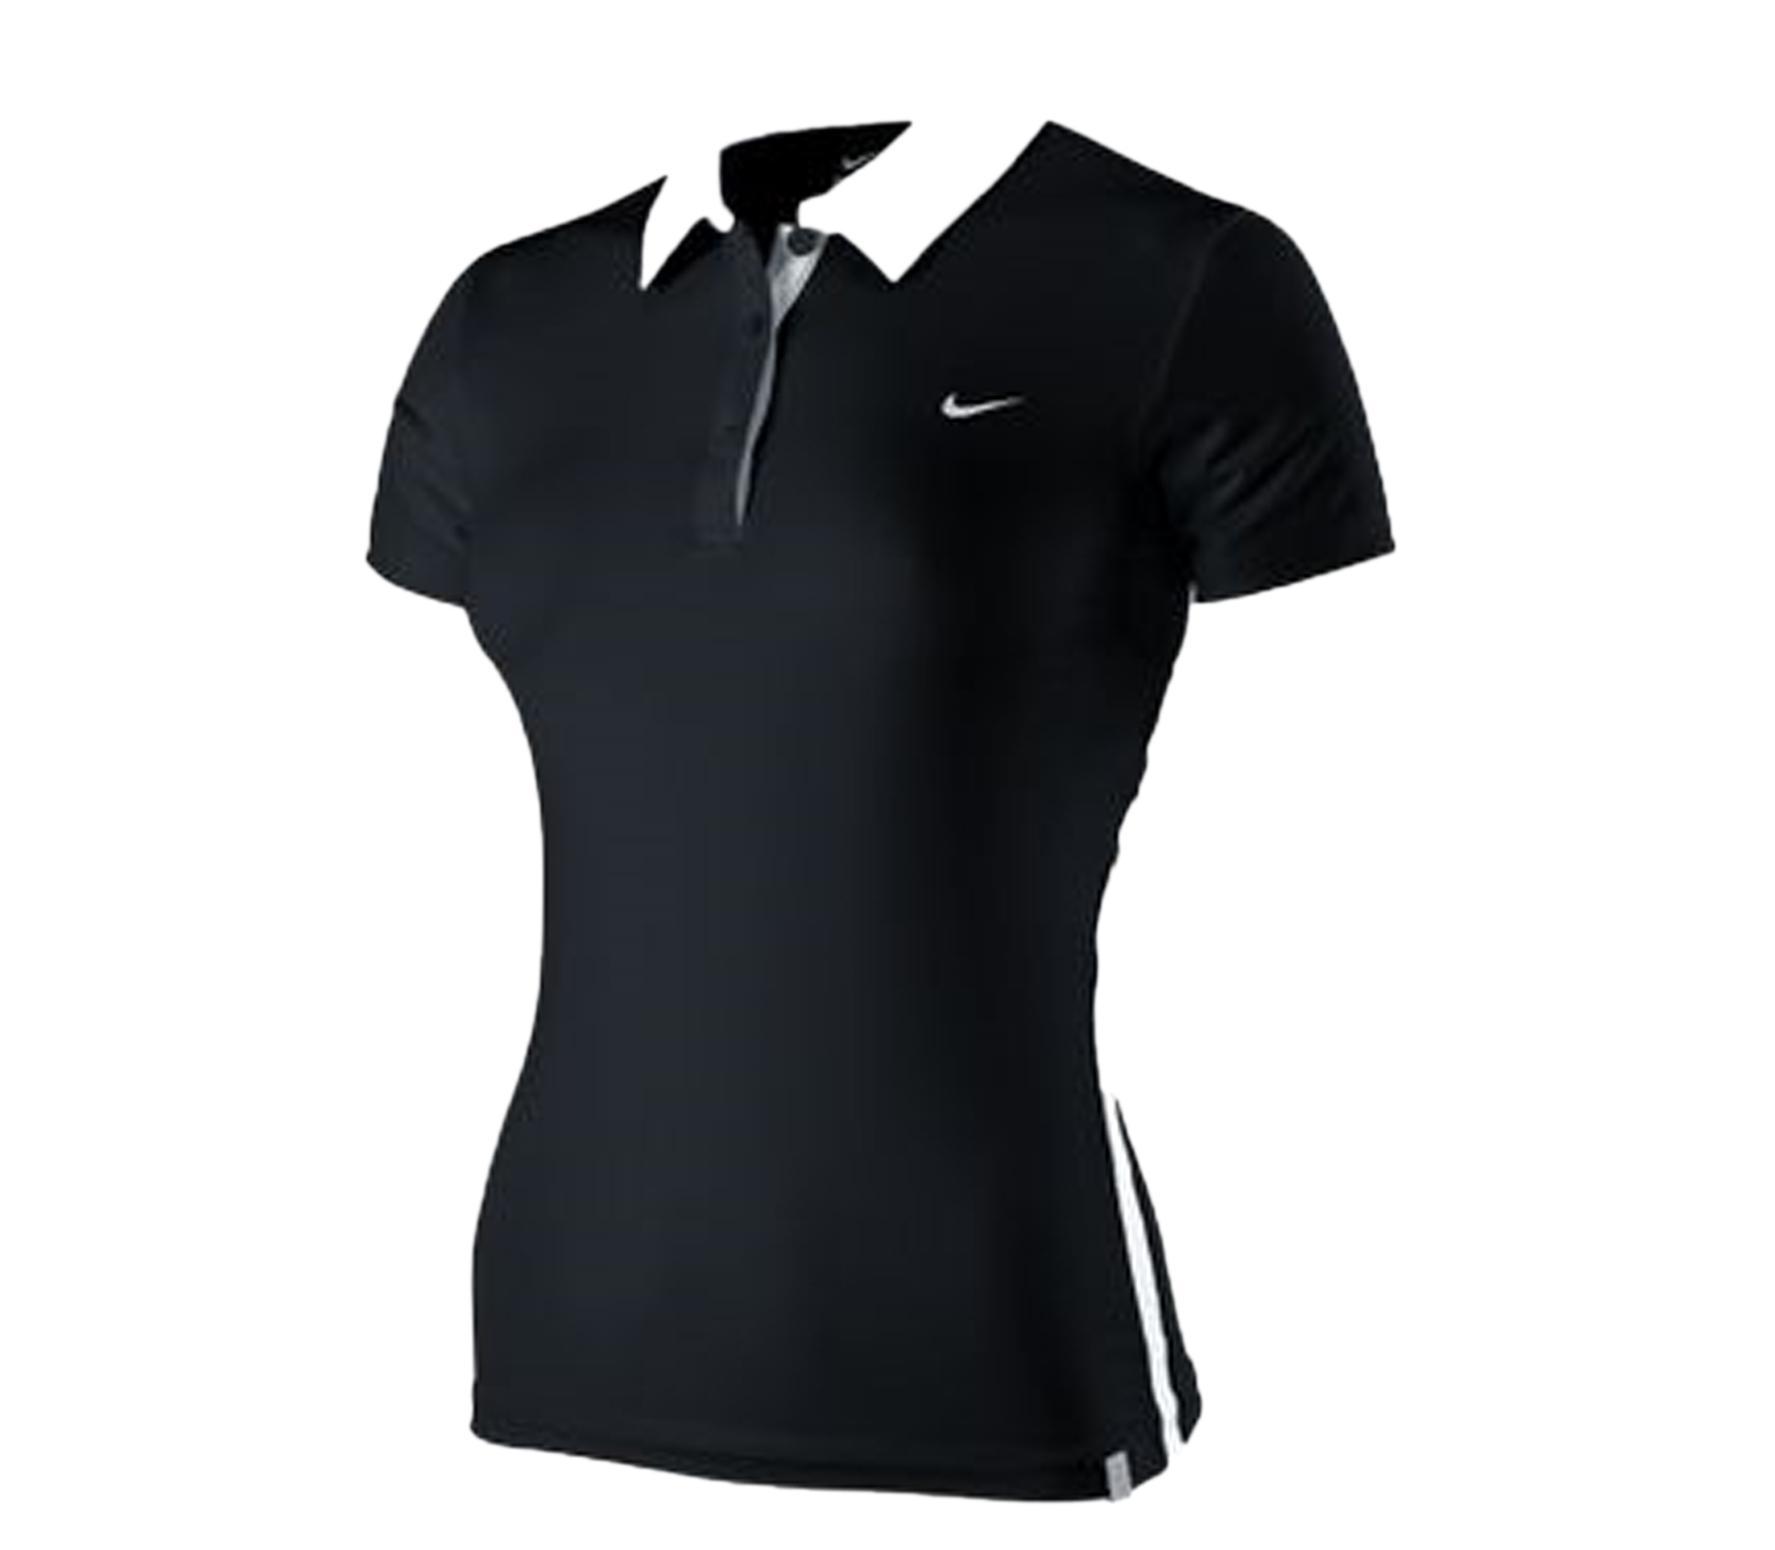 Foto Nike - Border Polo - negro/blanco - Ropa de tenis